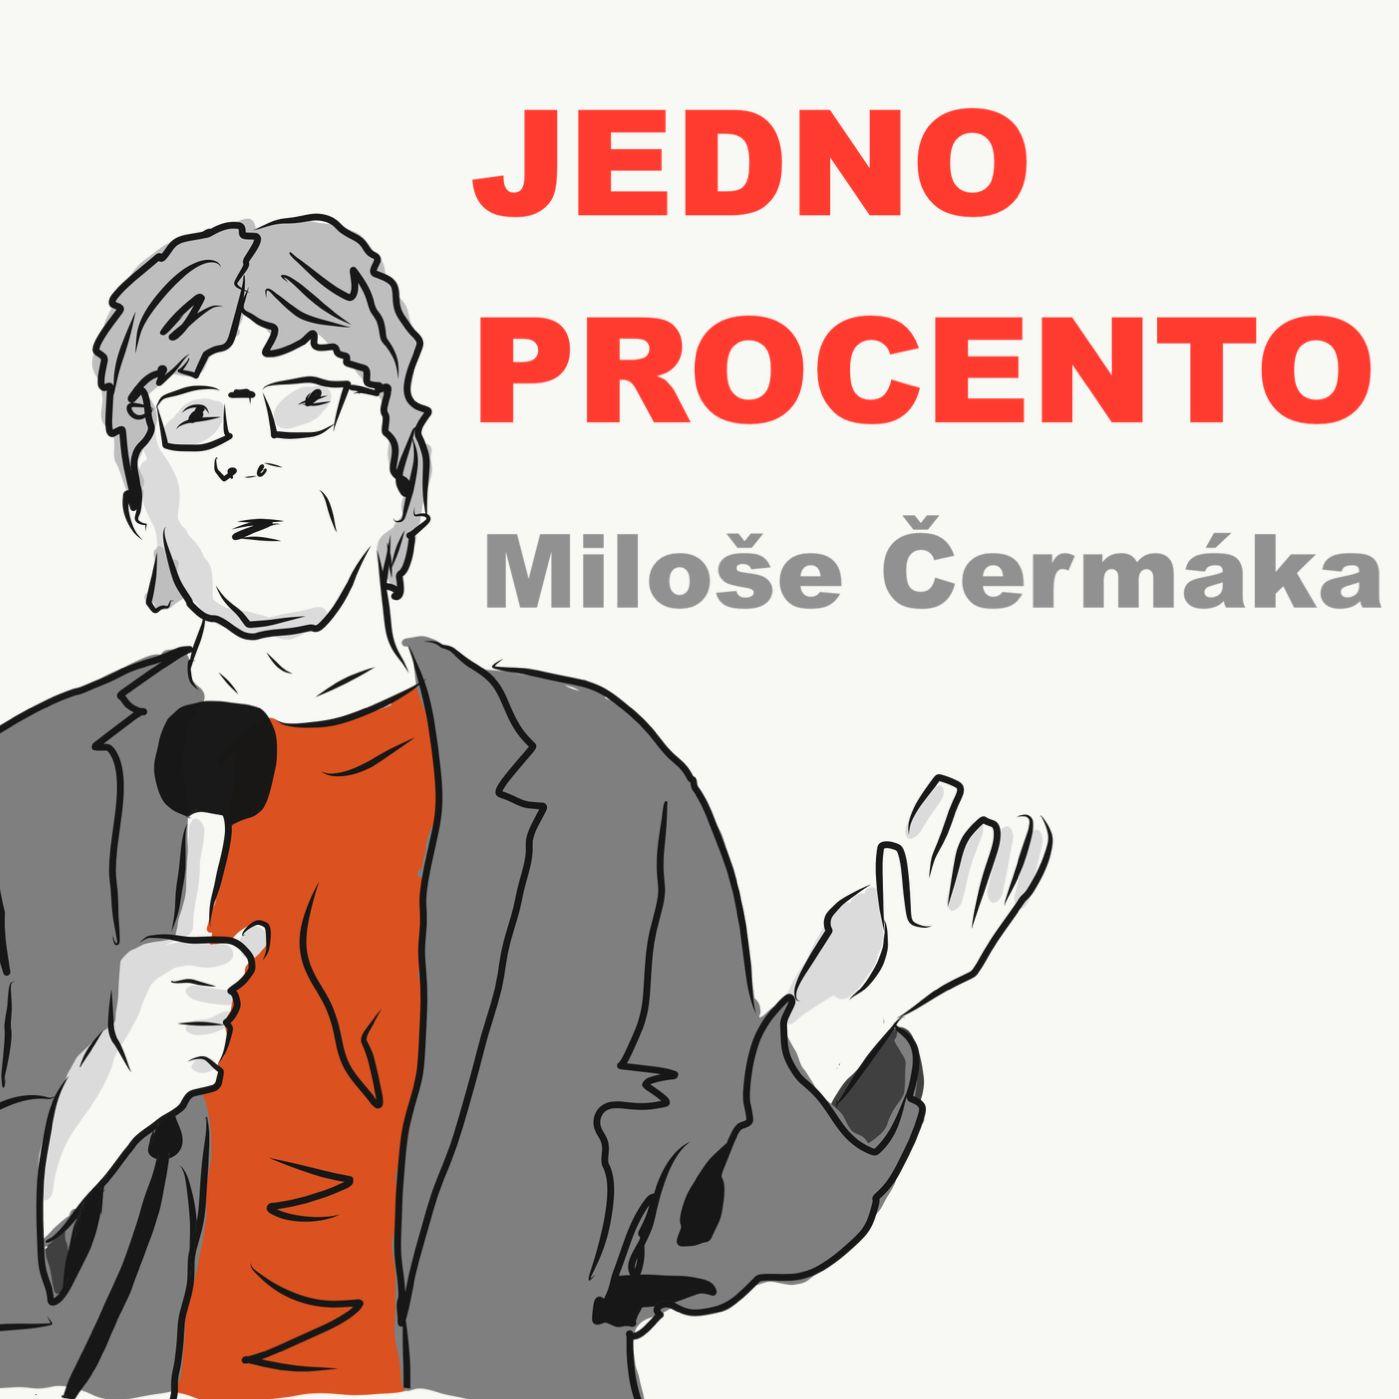 Jedno procento Miloše Čermáka - s Petrem Ludwigem